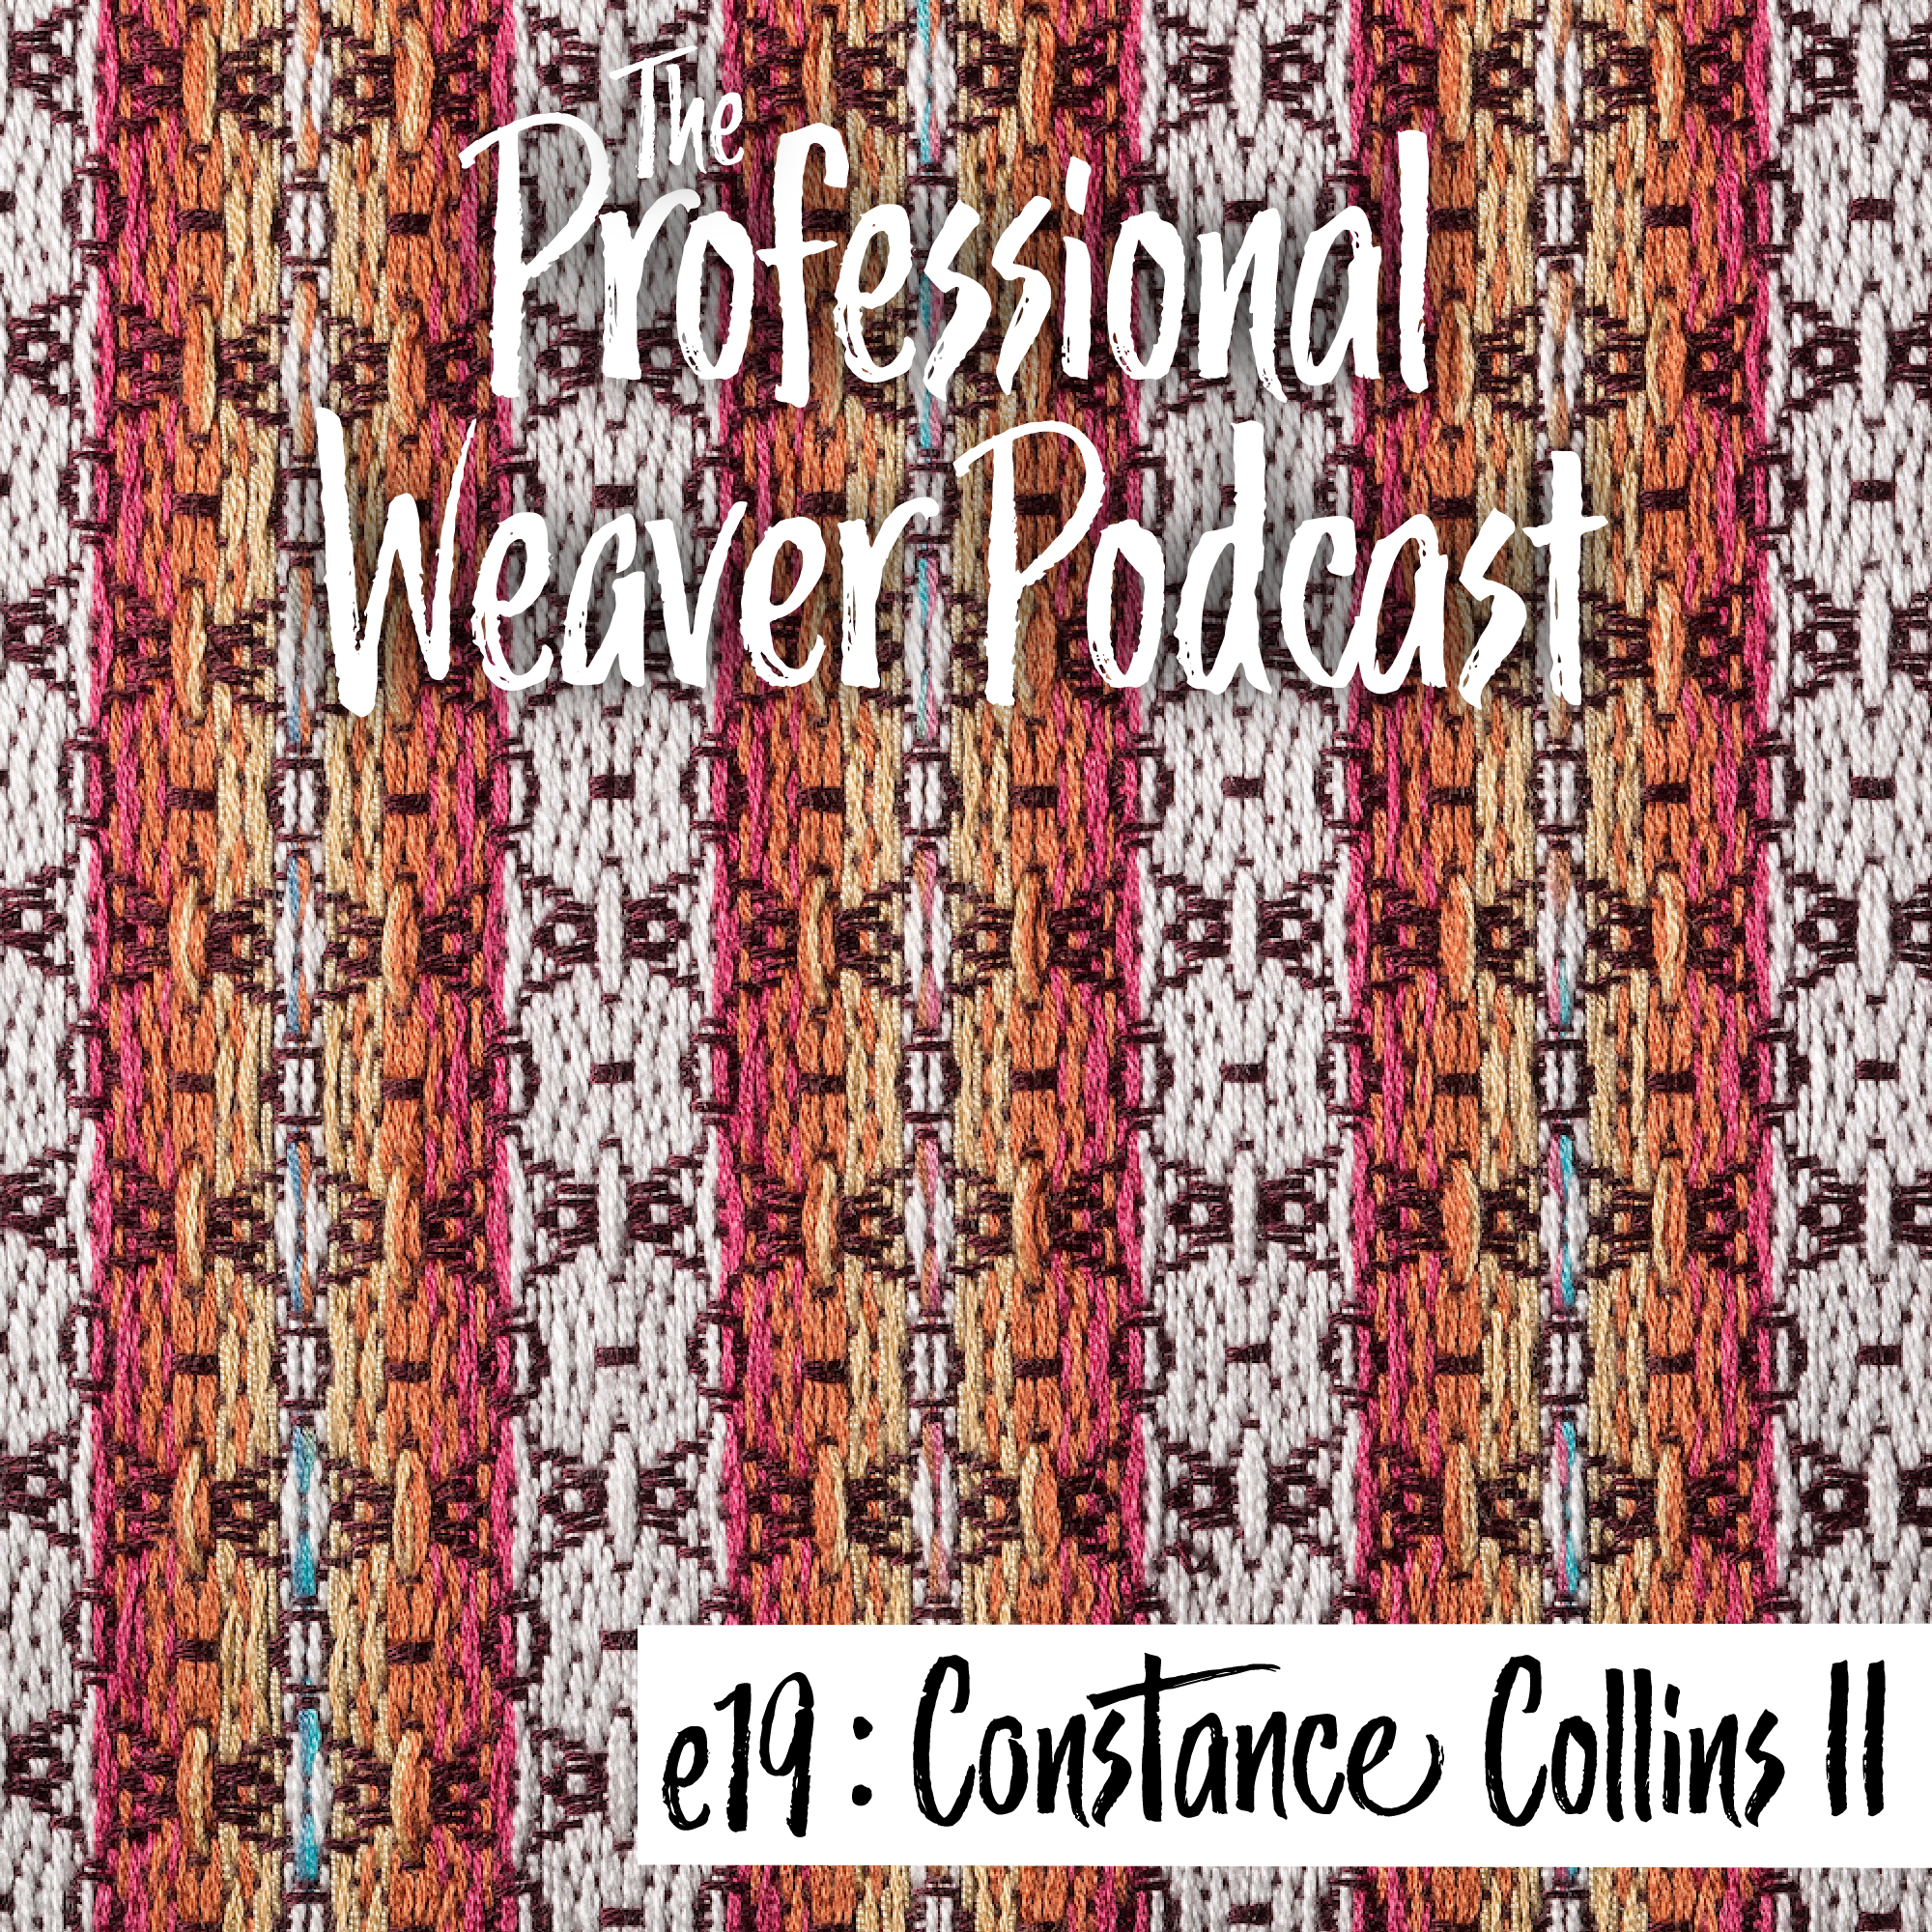 Pro Weaver Pod : Ep 19 : Constance Collins II